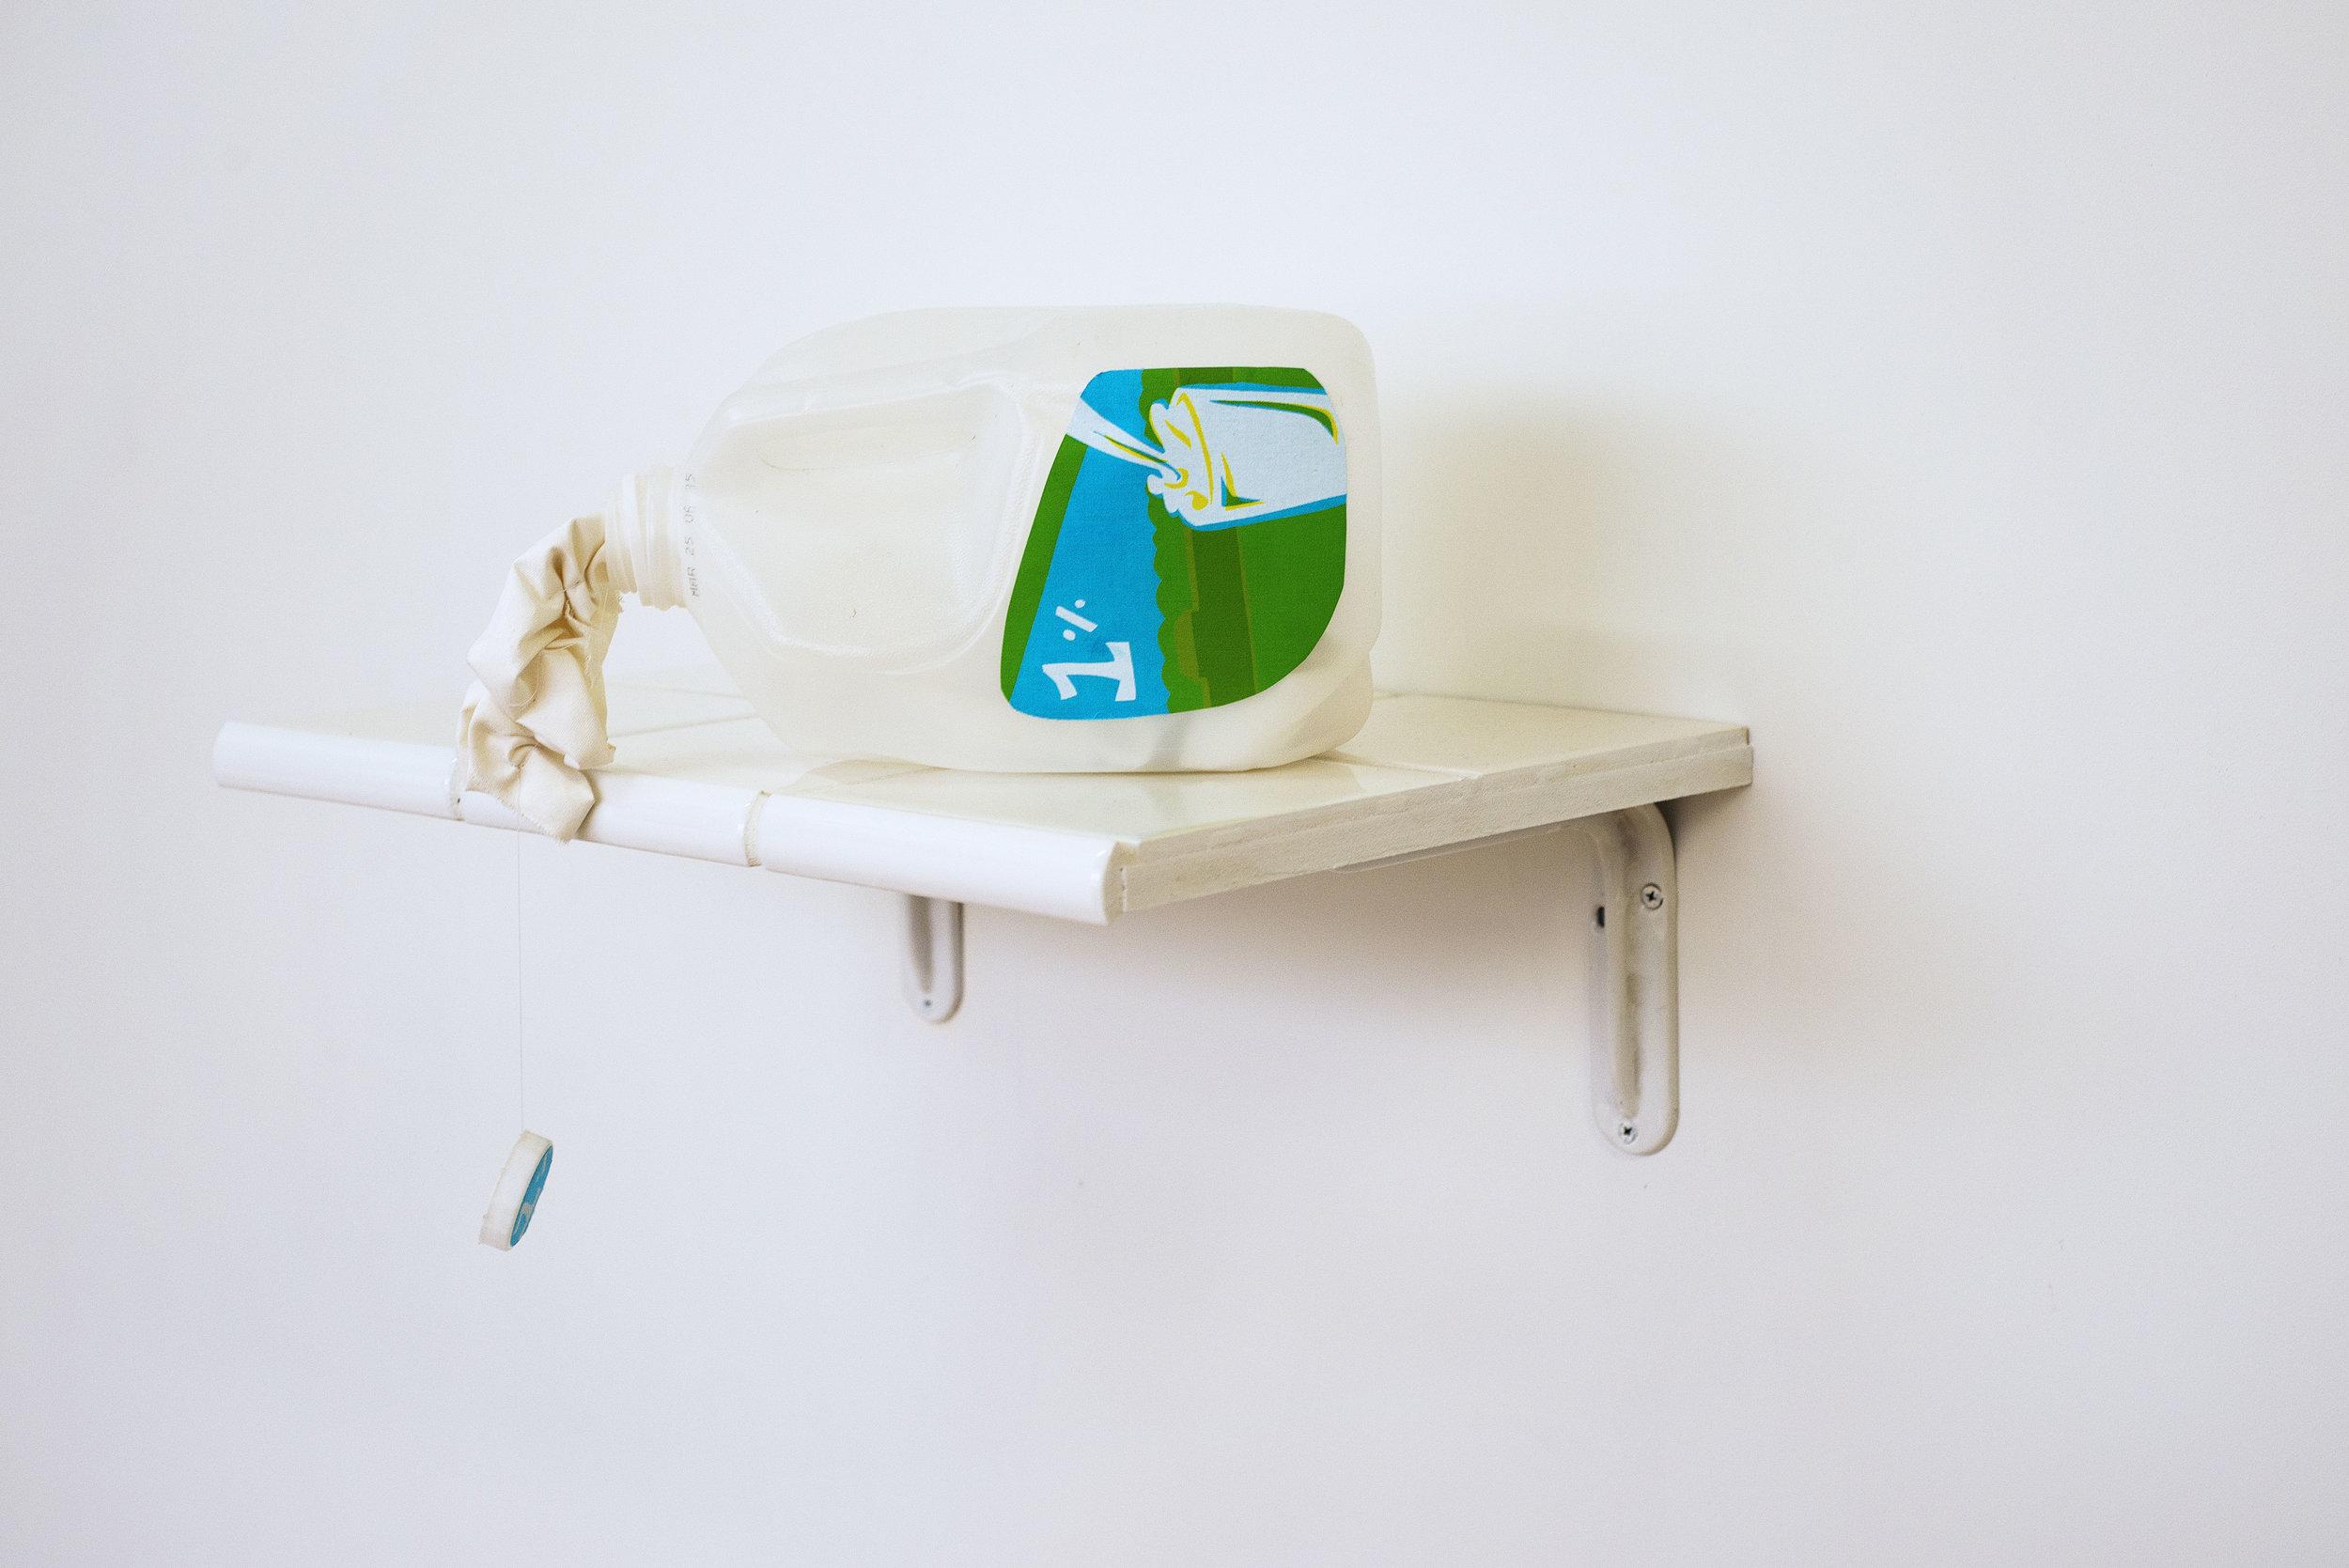 """Splittin'"", 2016, Screen-printed fabric, 1-gal milk jug, blackout fabric, tile, grout, MDF"